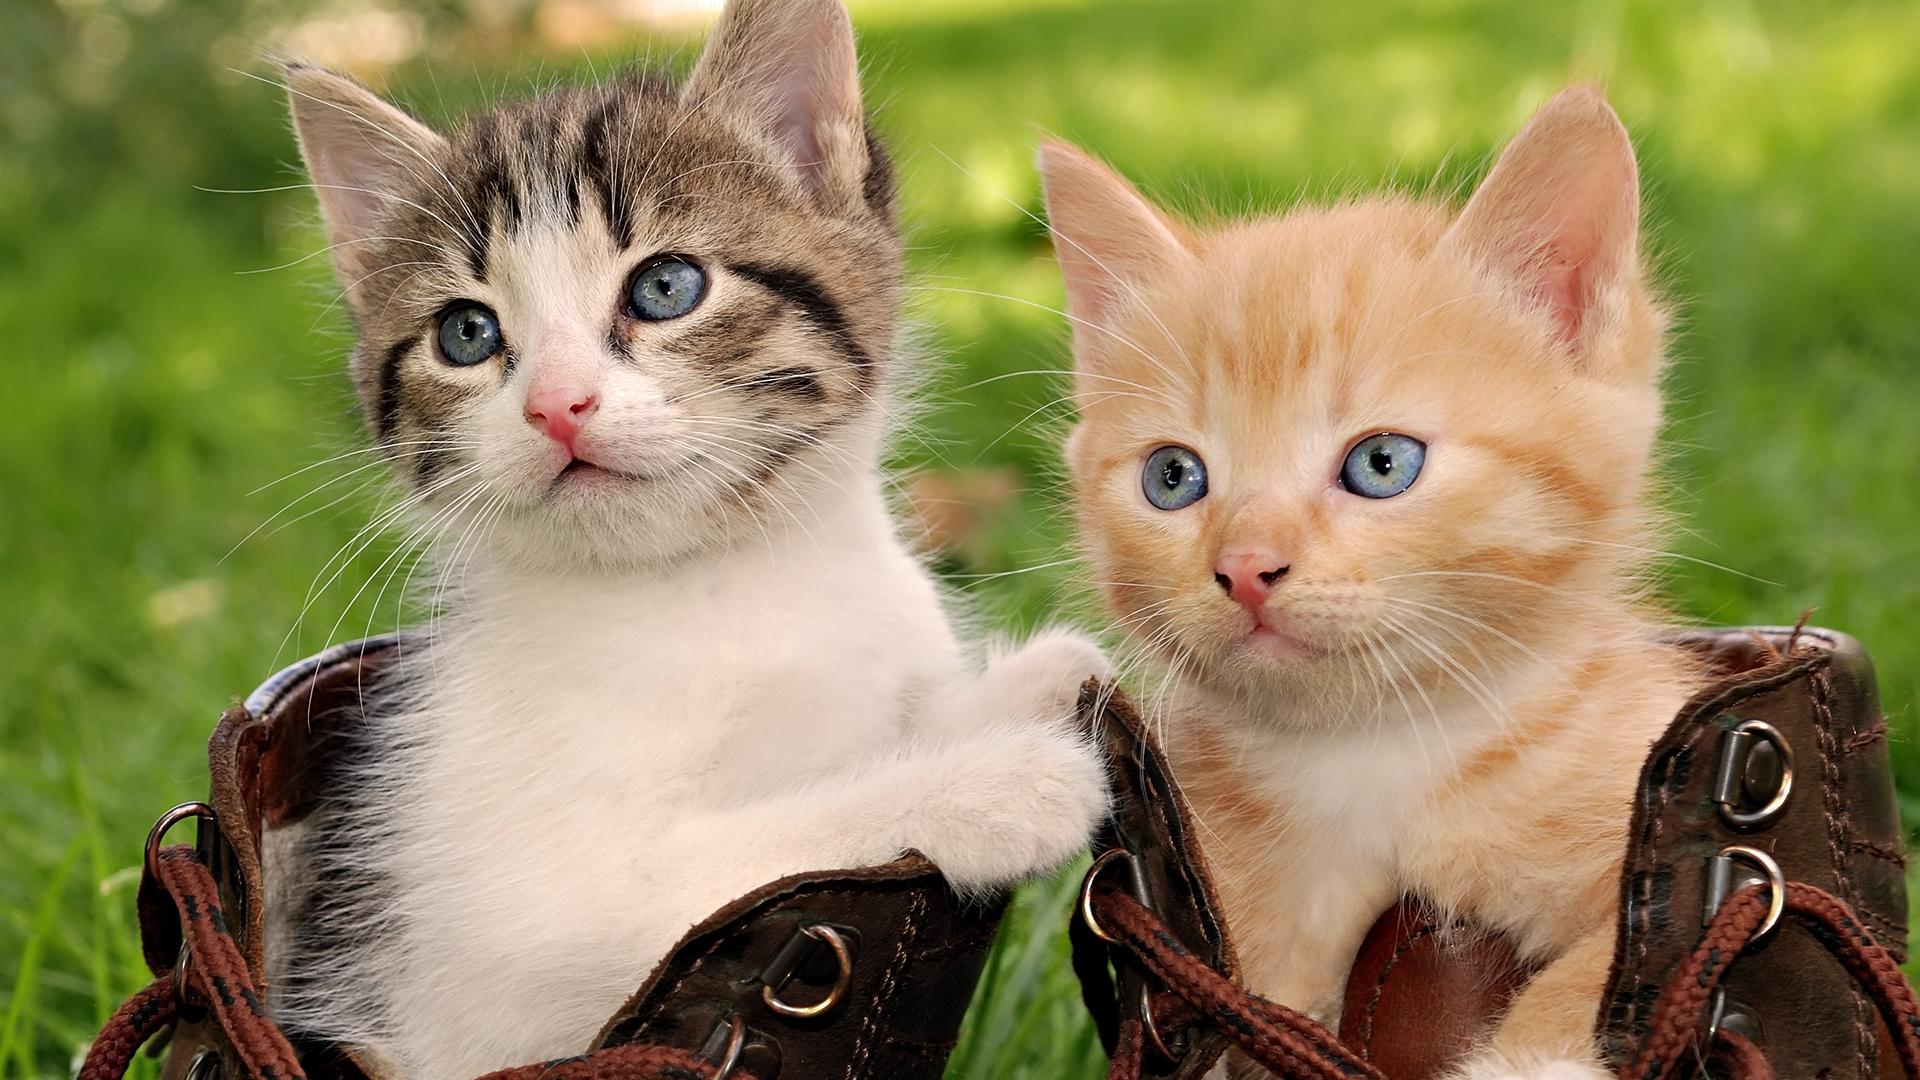 Cute Cat Hd Wallpapers For Mobile Double Cat Wallpaper Pixelstalk Net